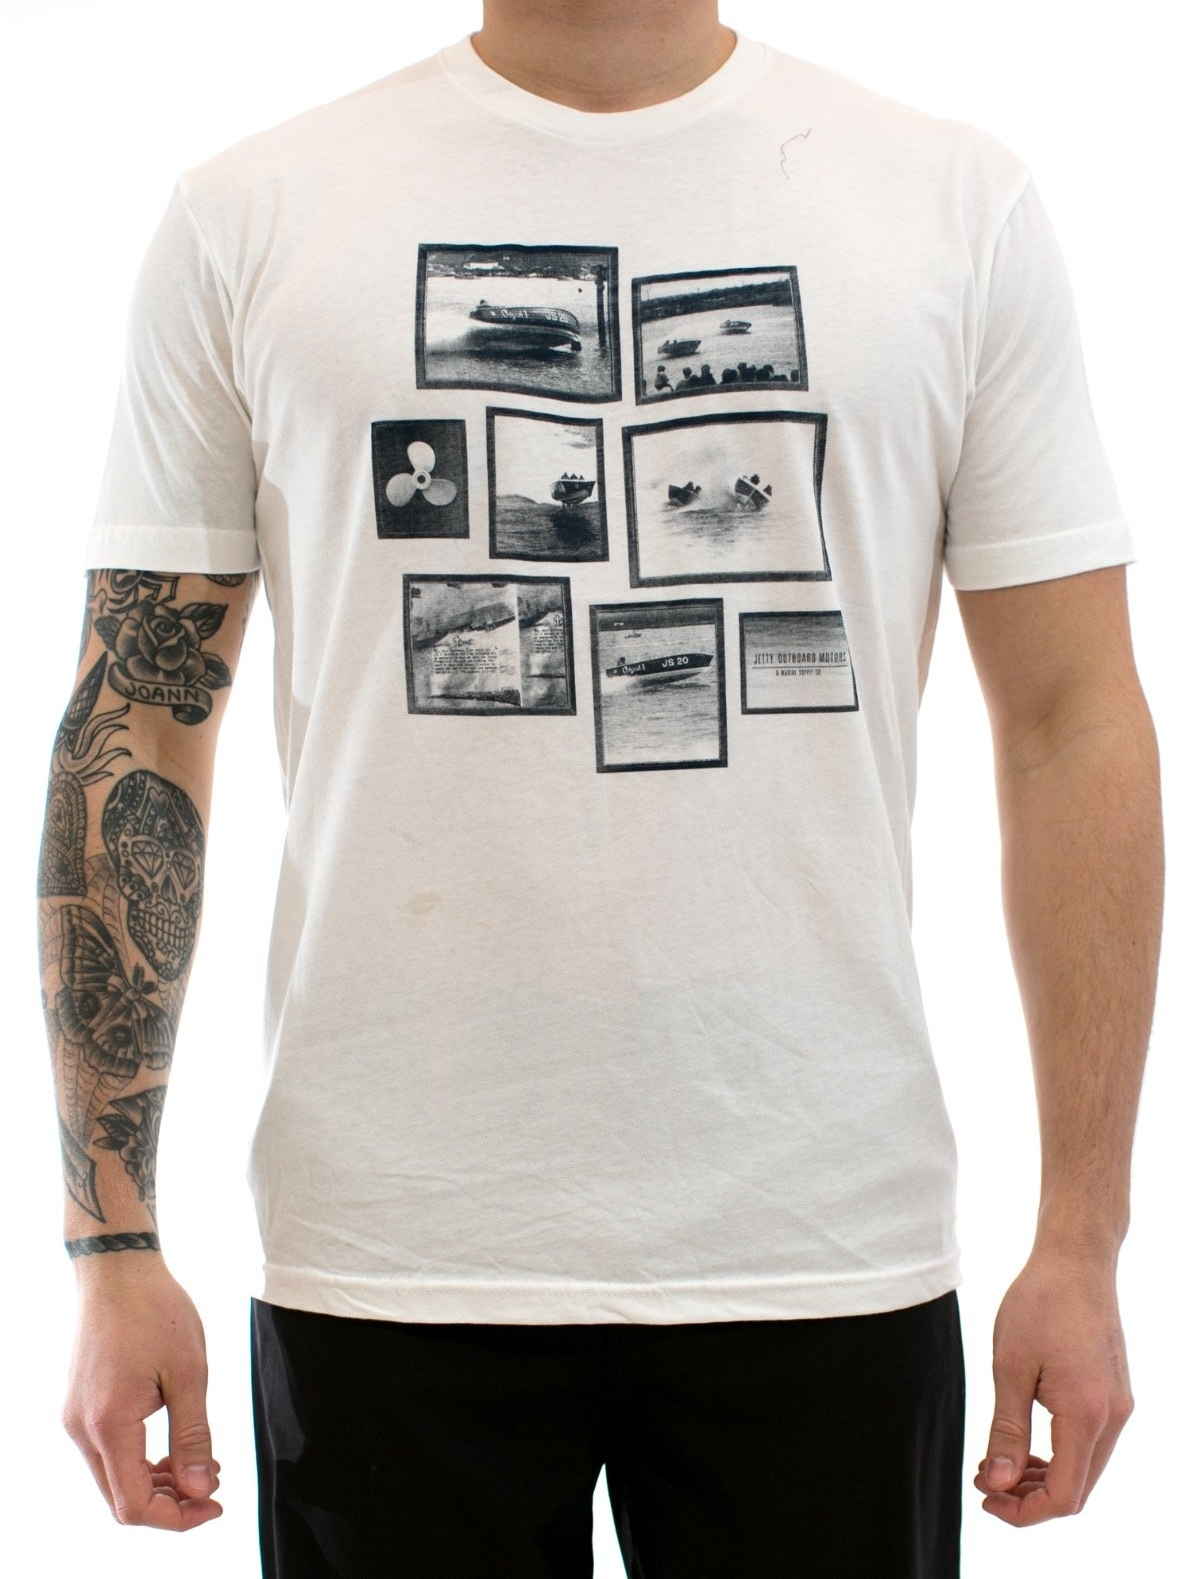 Level 3 : Jetty Blue/White LBI Boat Race Shirt